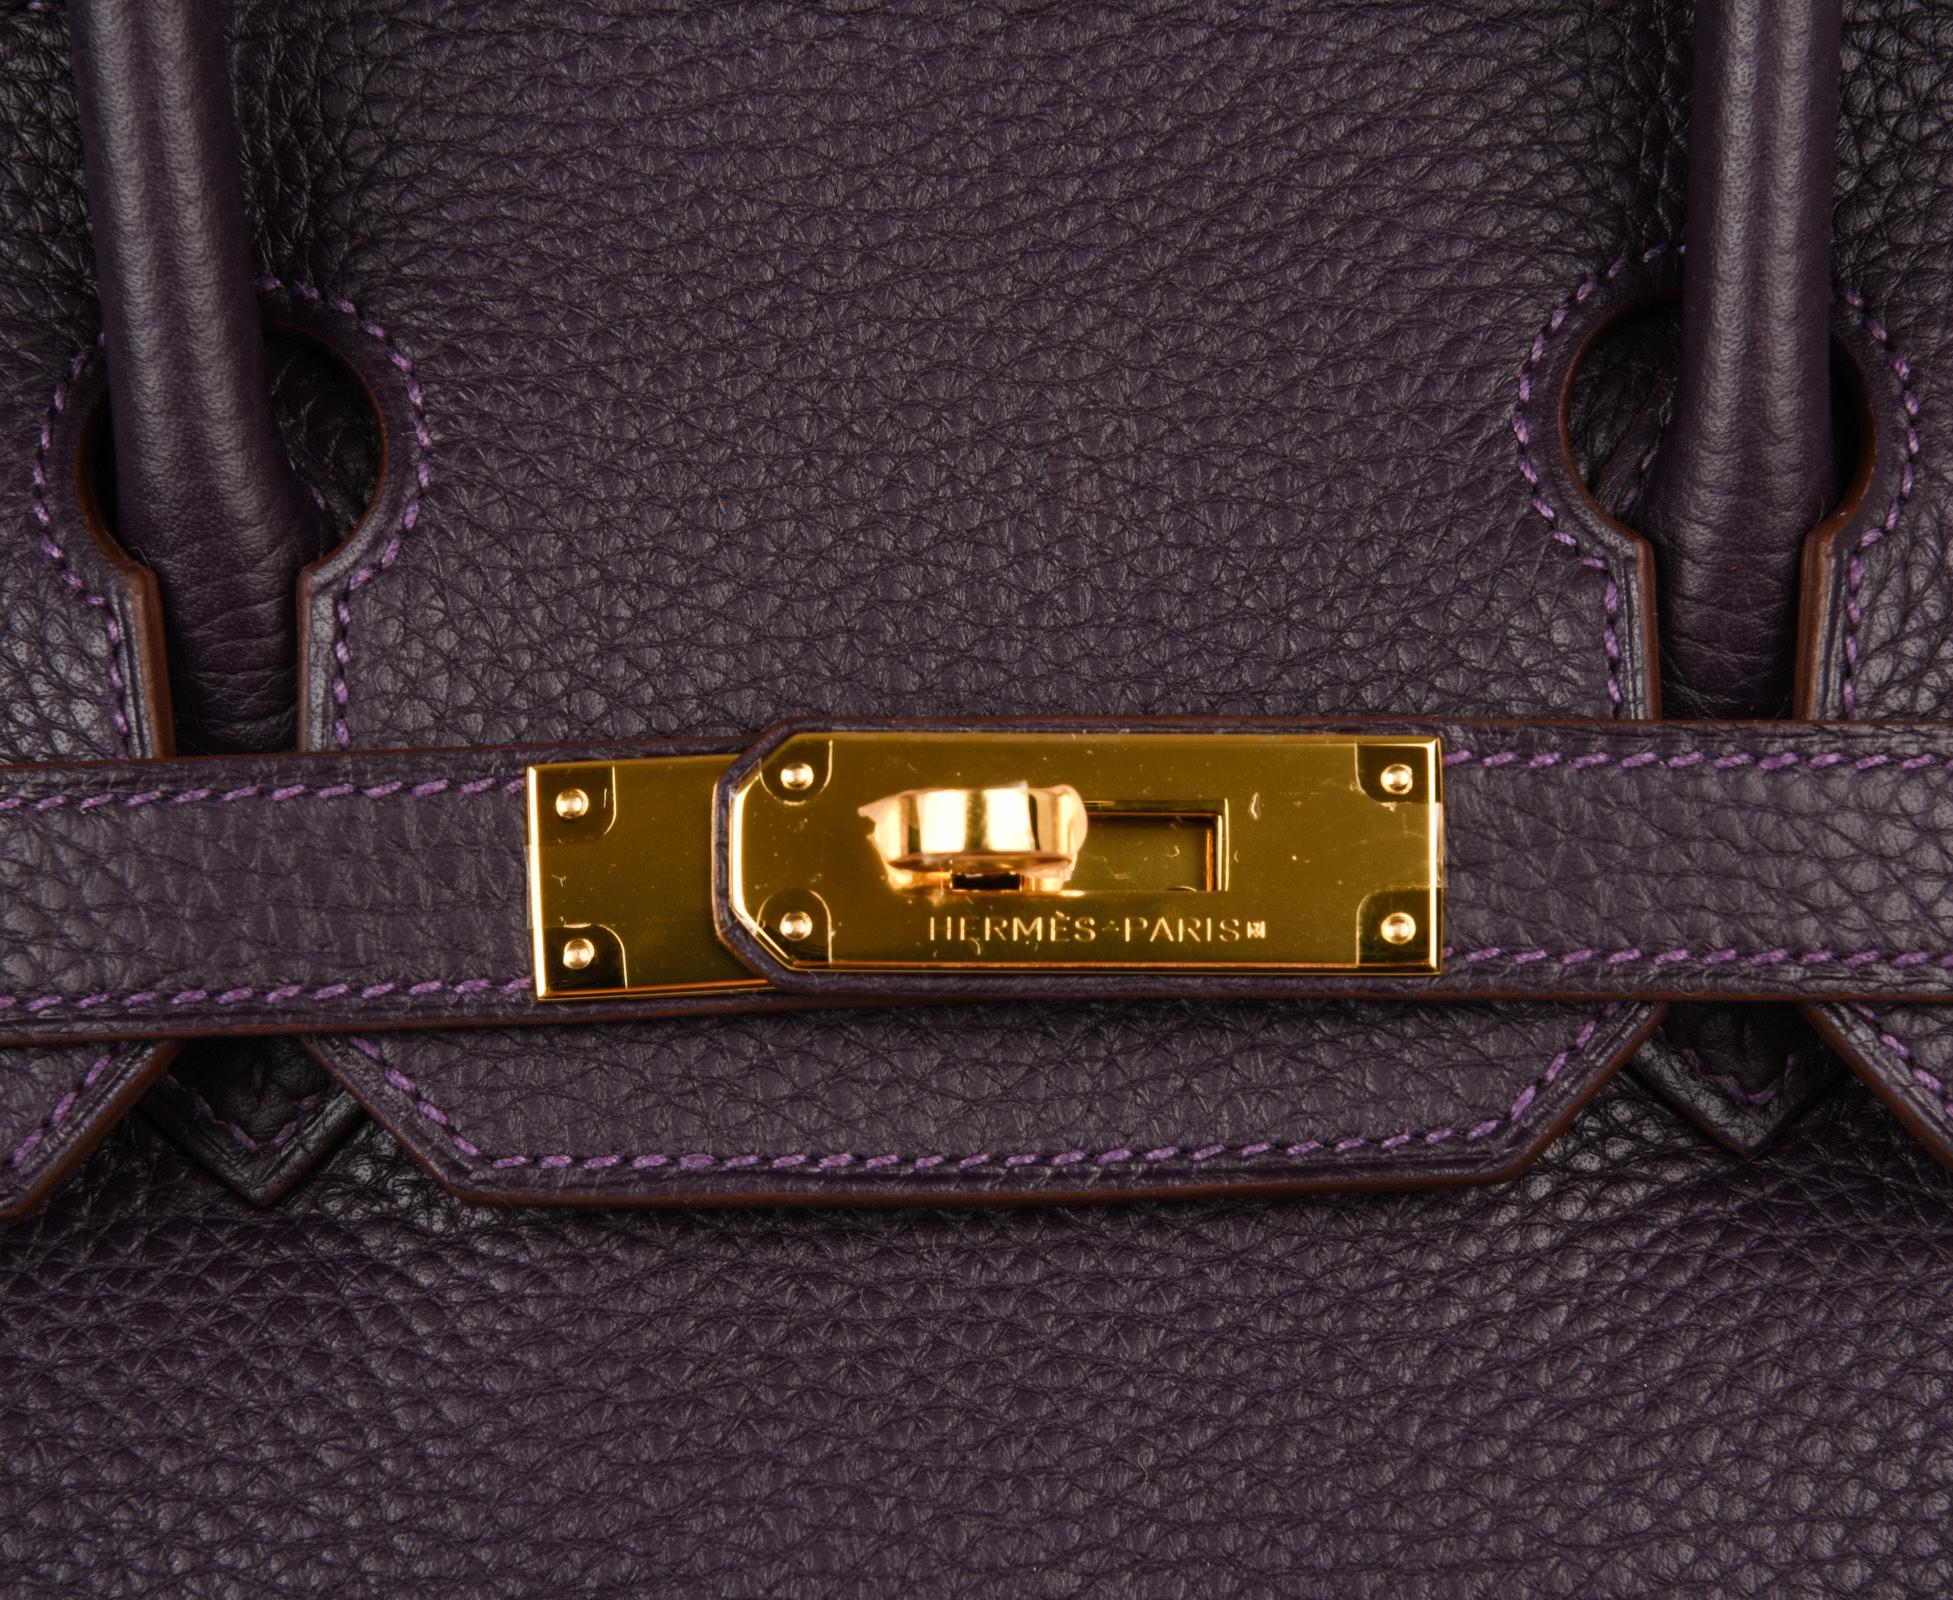 6adfc1332588 ... where can i buy womens hermes birkin 30 rich raisin gold hardware  original colour togo bag